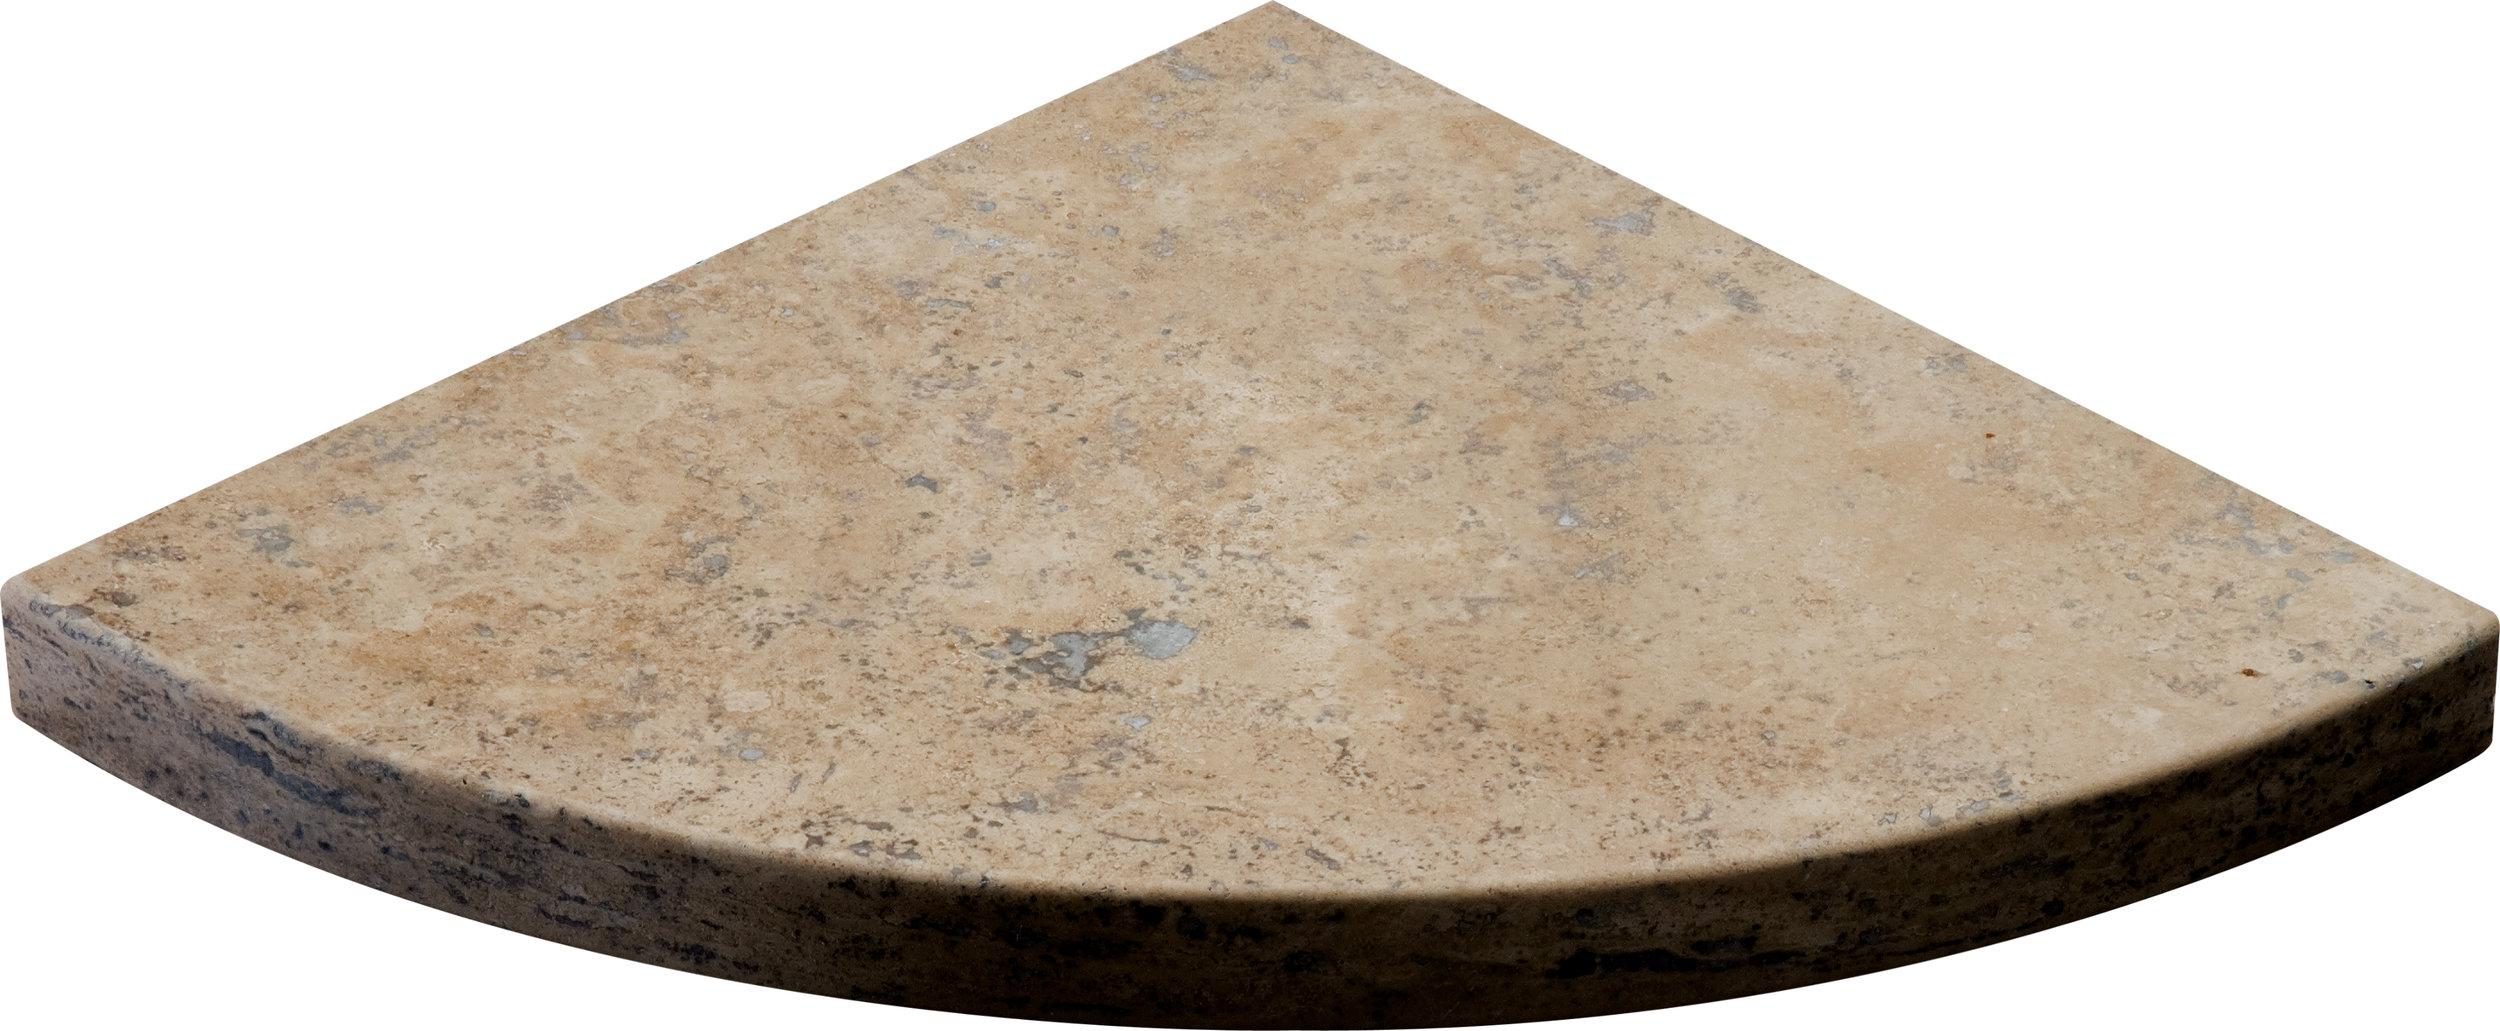 "SP00584 walnut dark honed & filled corner shelf 8""x8""x3/4"""